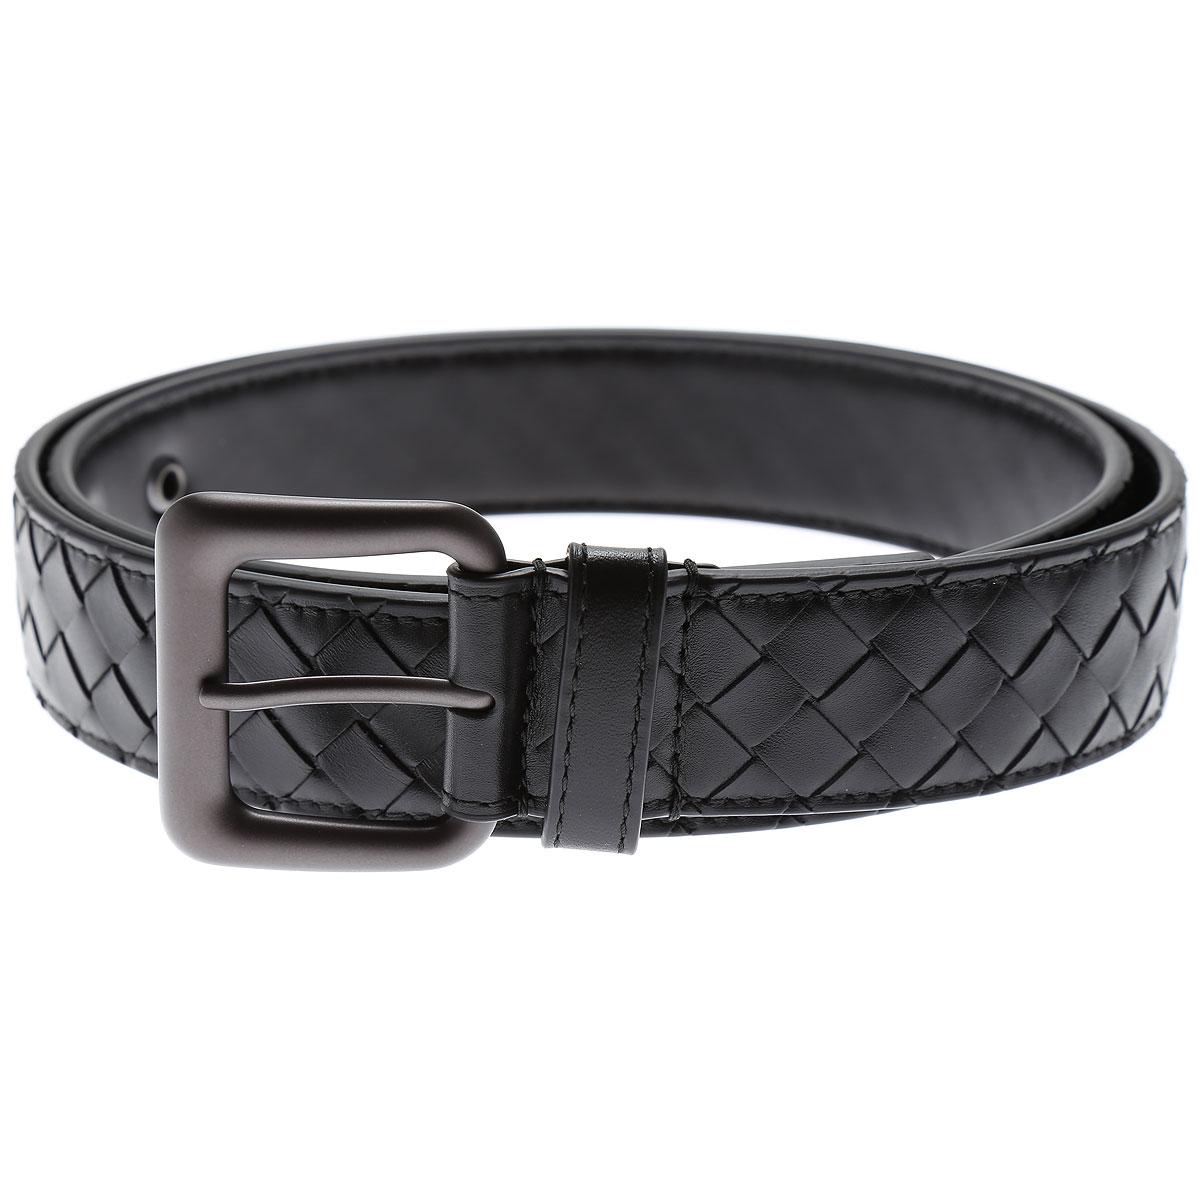 Bottega Veneta Belts On Sale, Black, Leather, 2019, 36 38 40 42